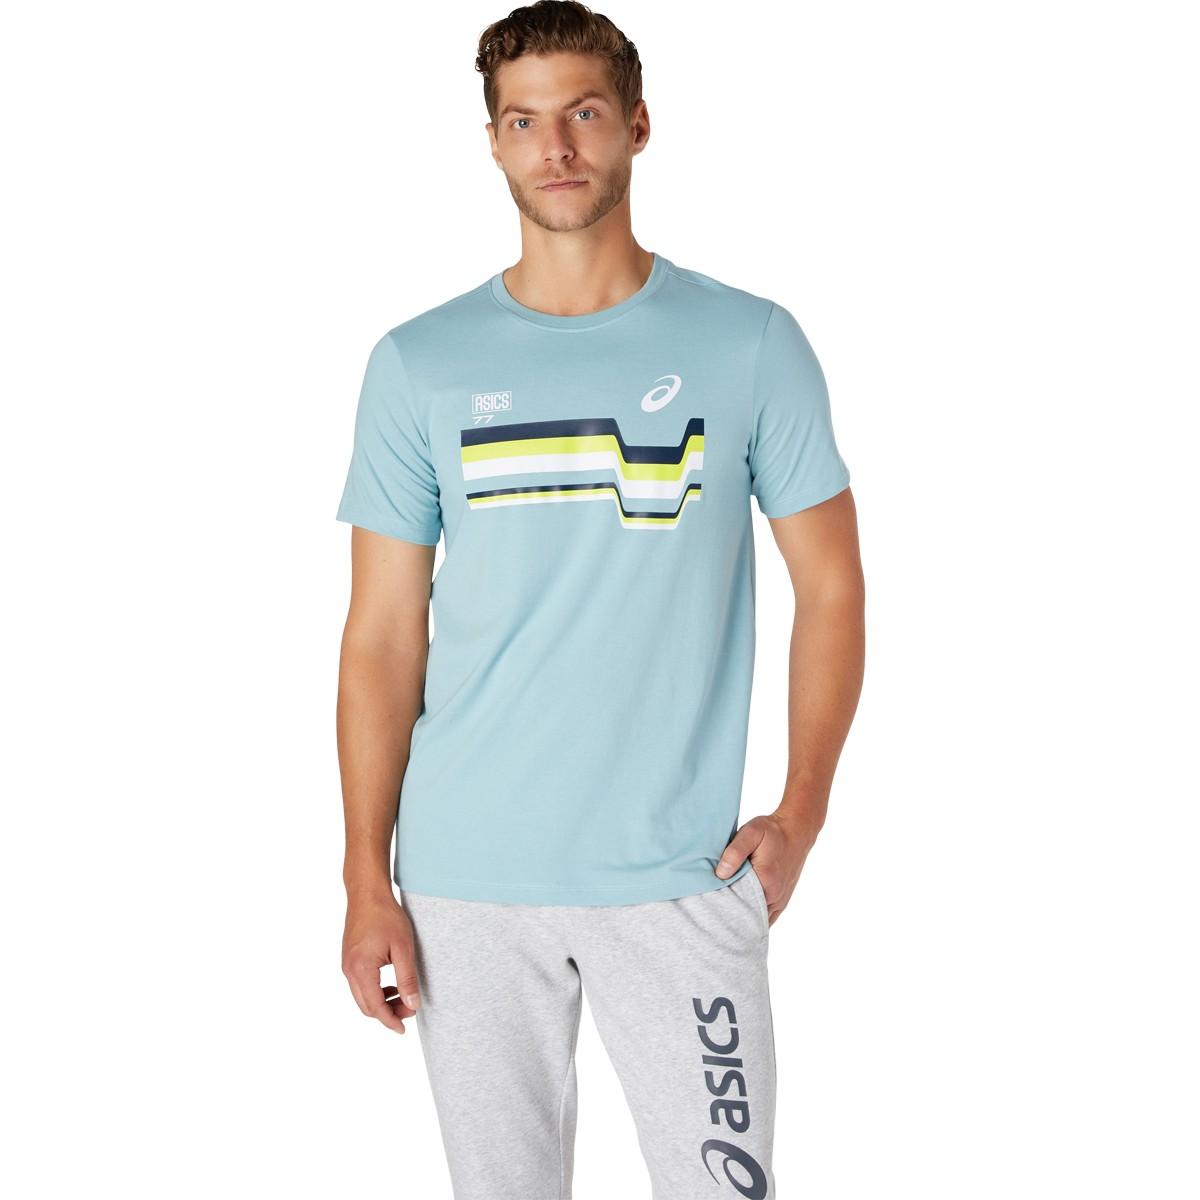 ASICS 77 T-SHIRT - ASICS - Men's - Clothing | Tennispro